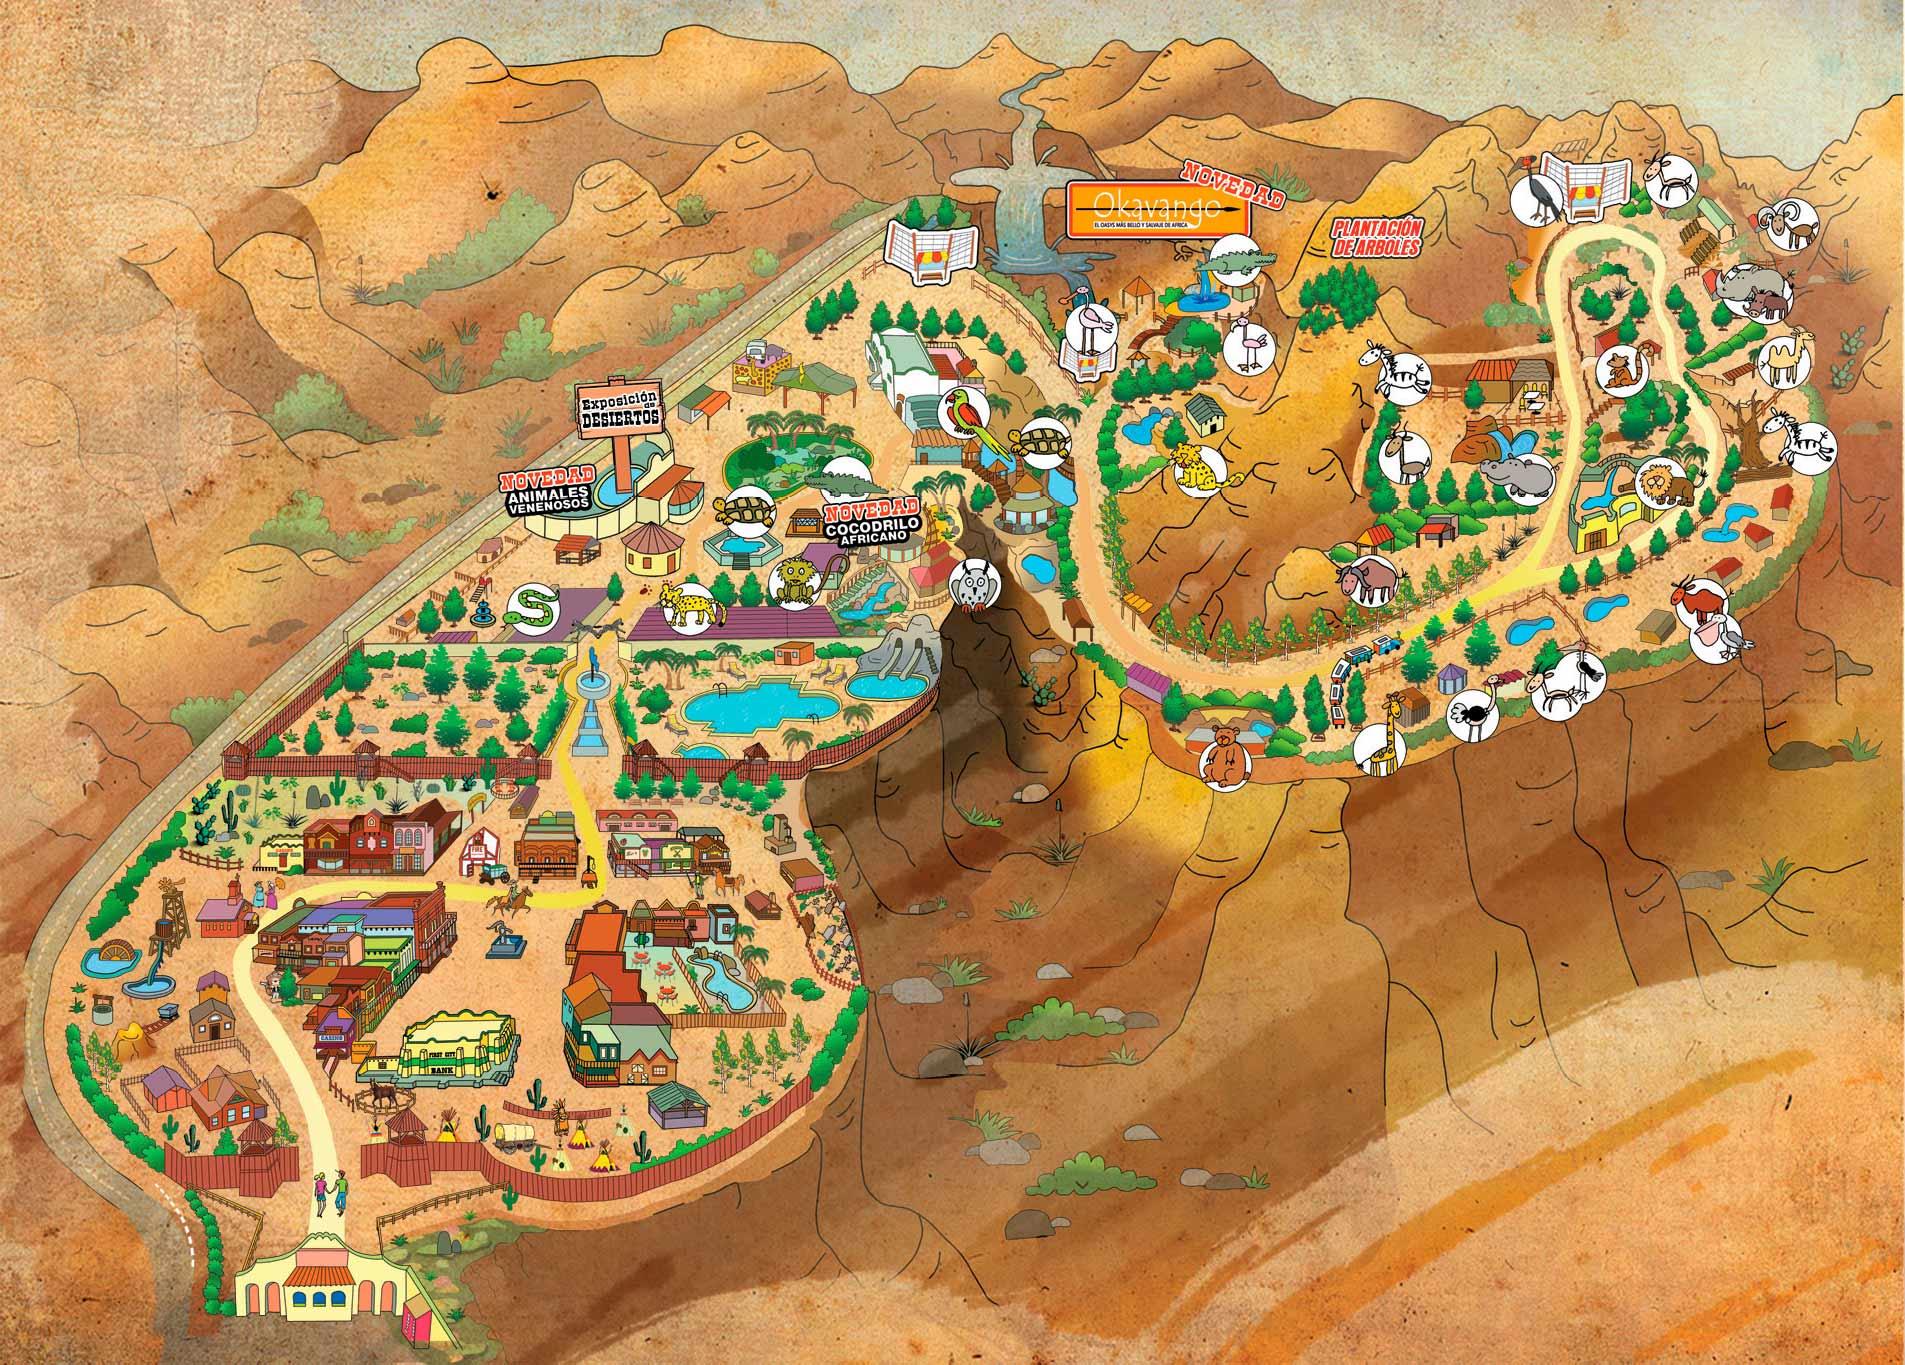 Mapa de Oasys Minihollywood